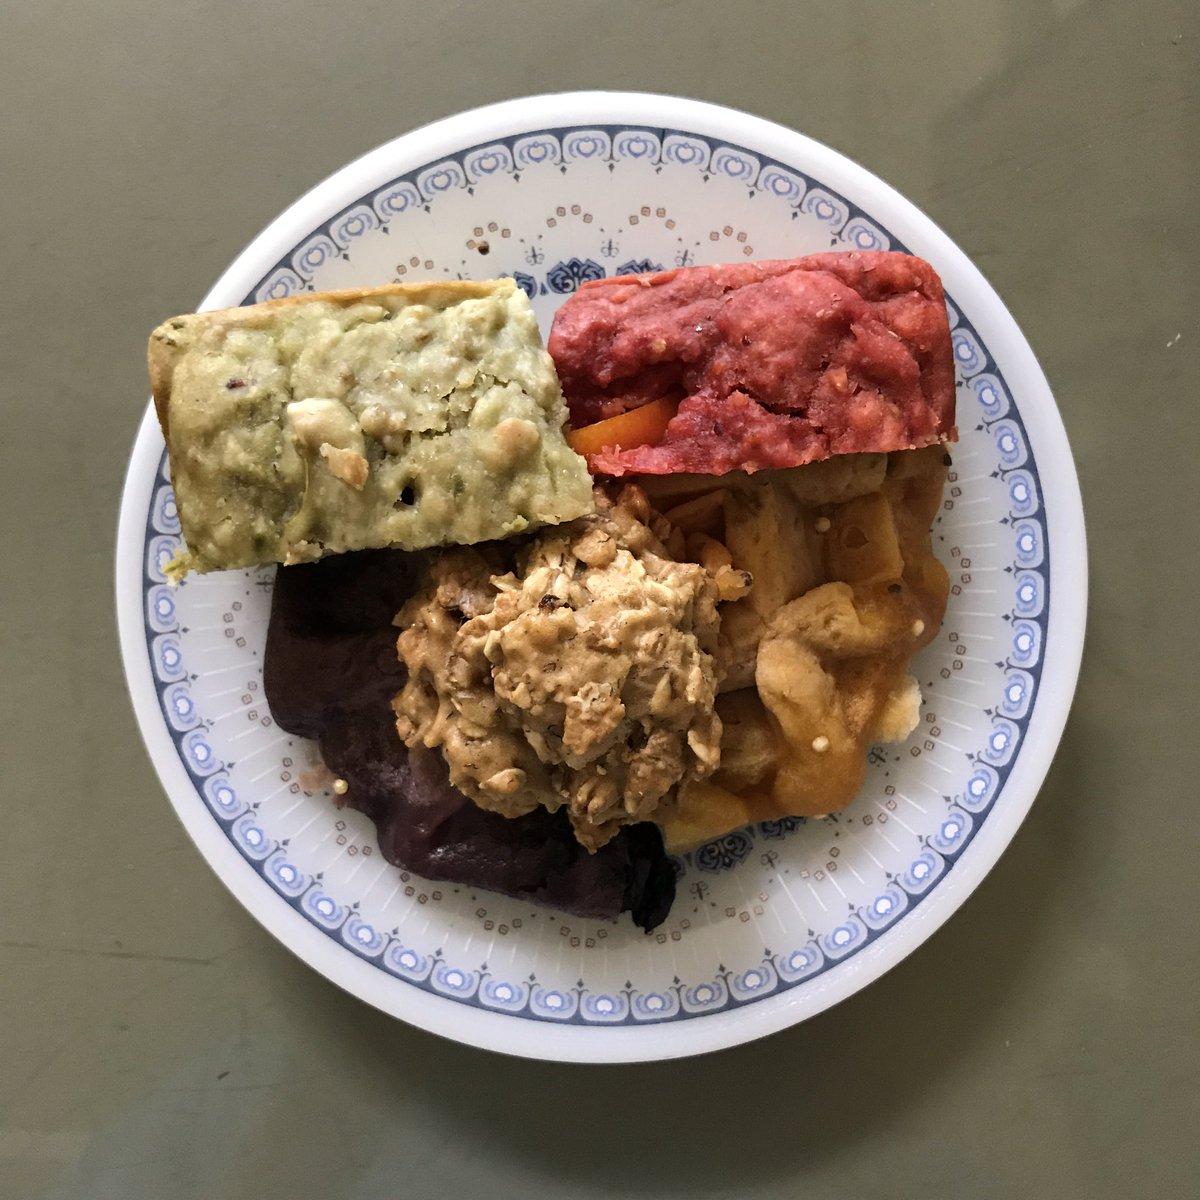 Sunday lunch break  #eatatease #leanlife #fewsfood #twinings #แด่งานของฉันแด่วันพรุ่งนี้<br>http://pic.twitter.com/favAN7OoKR